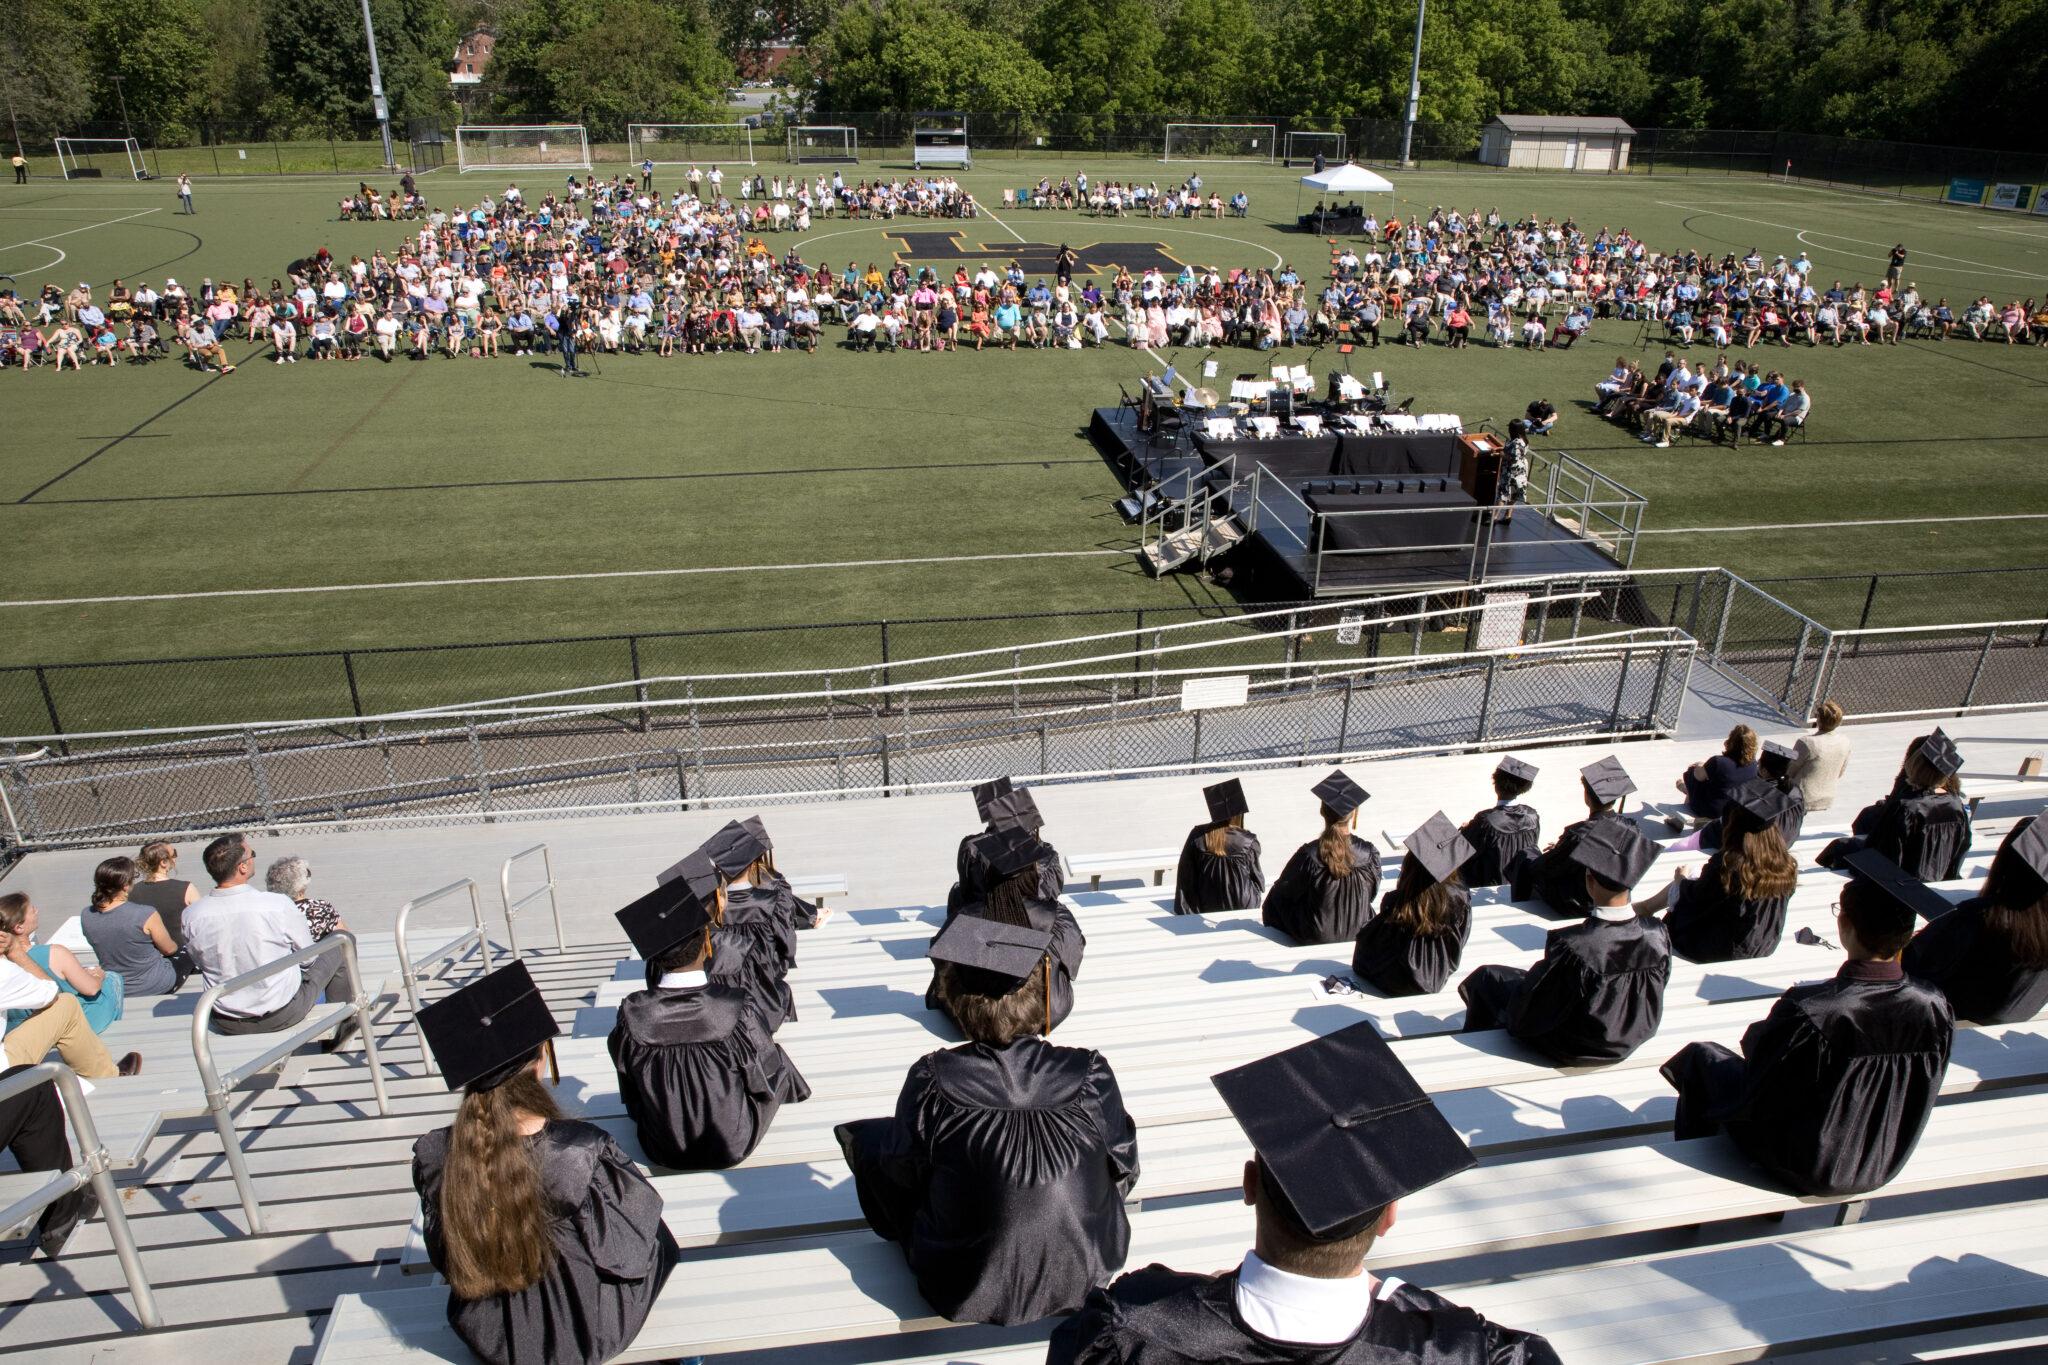 graduation service from bleachers into turf field view